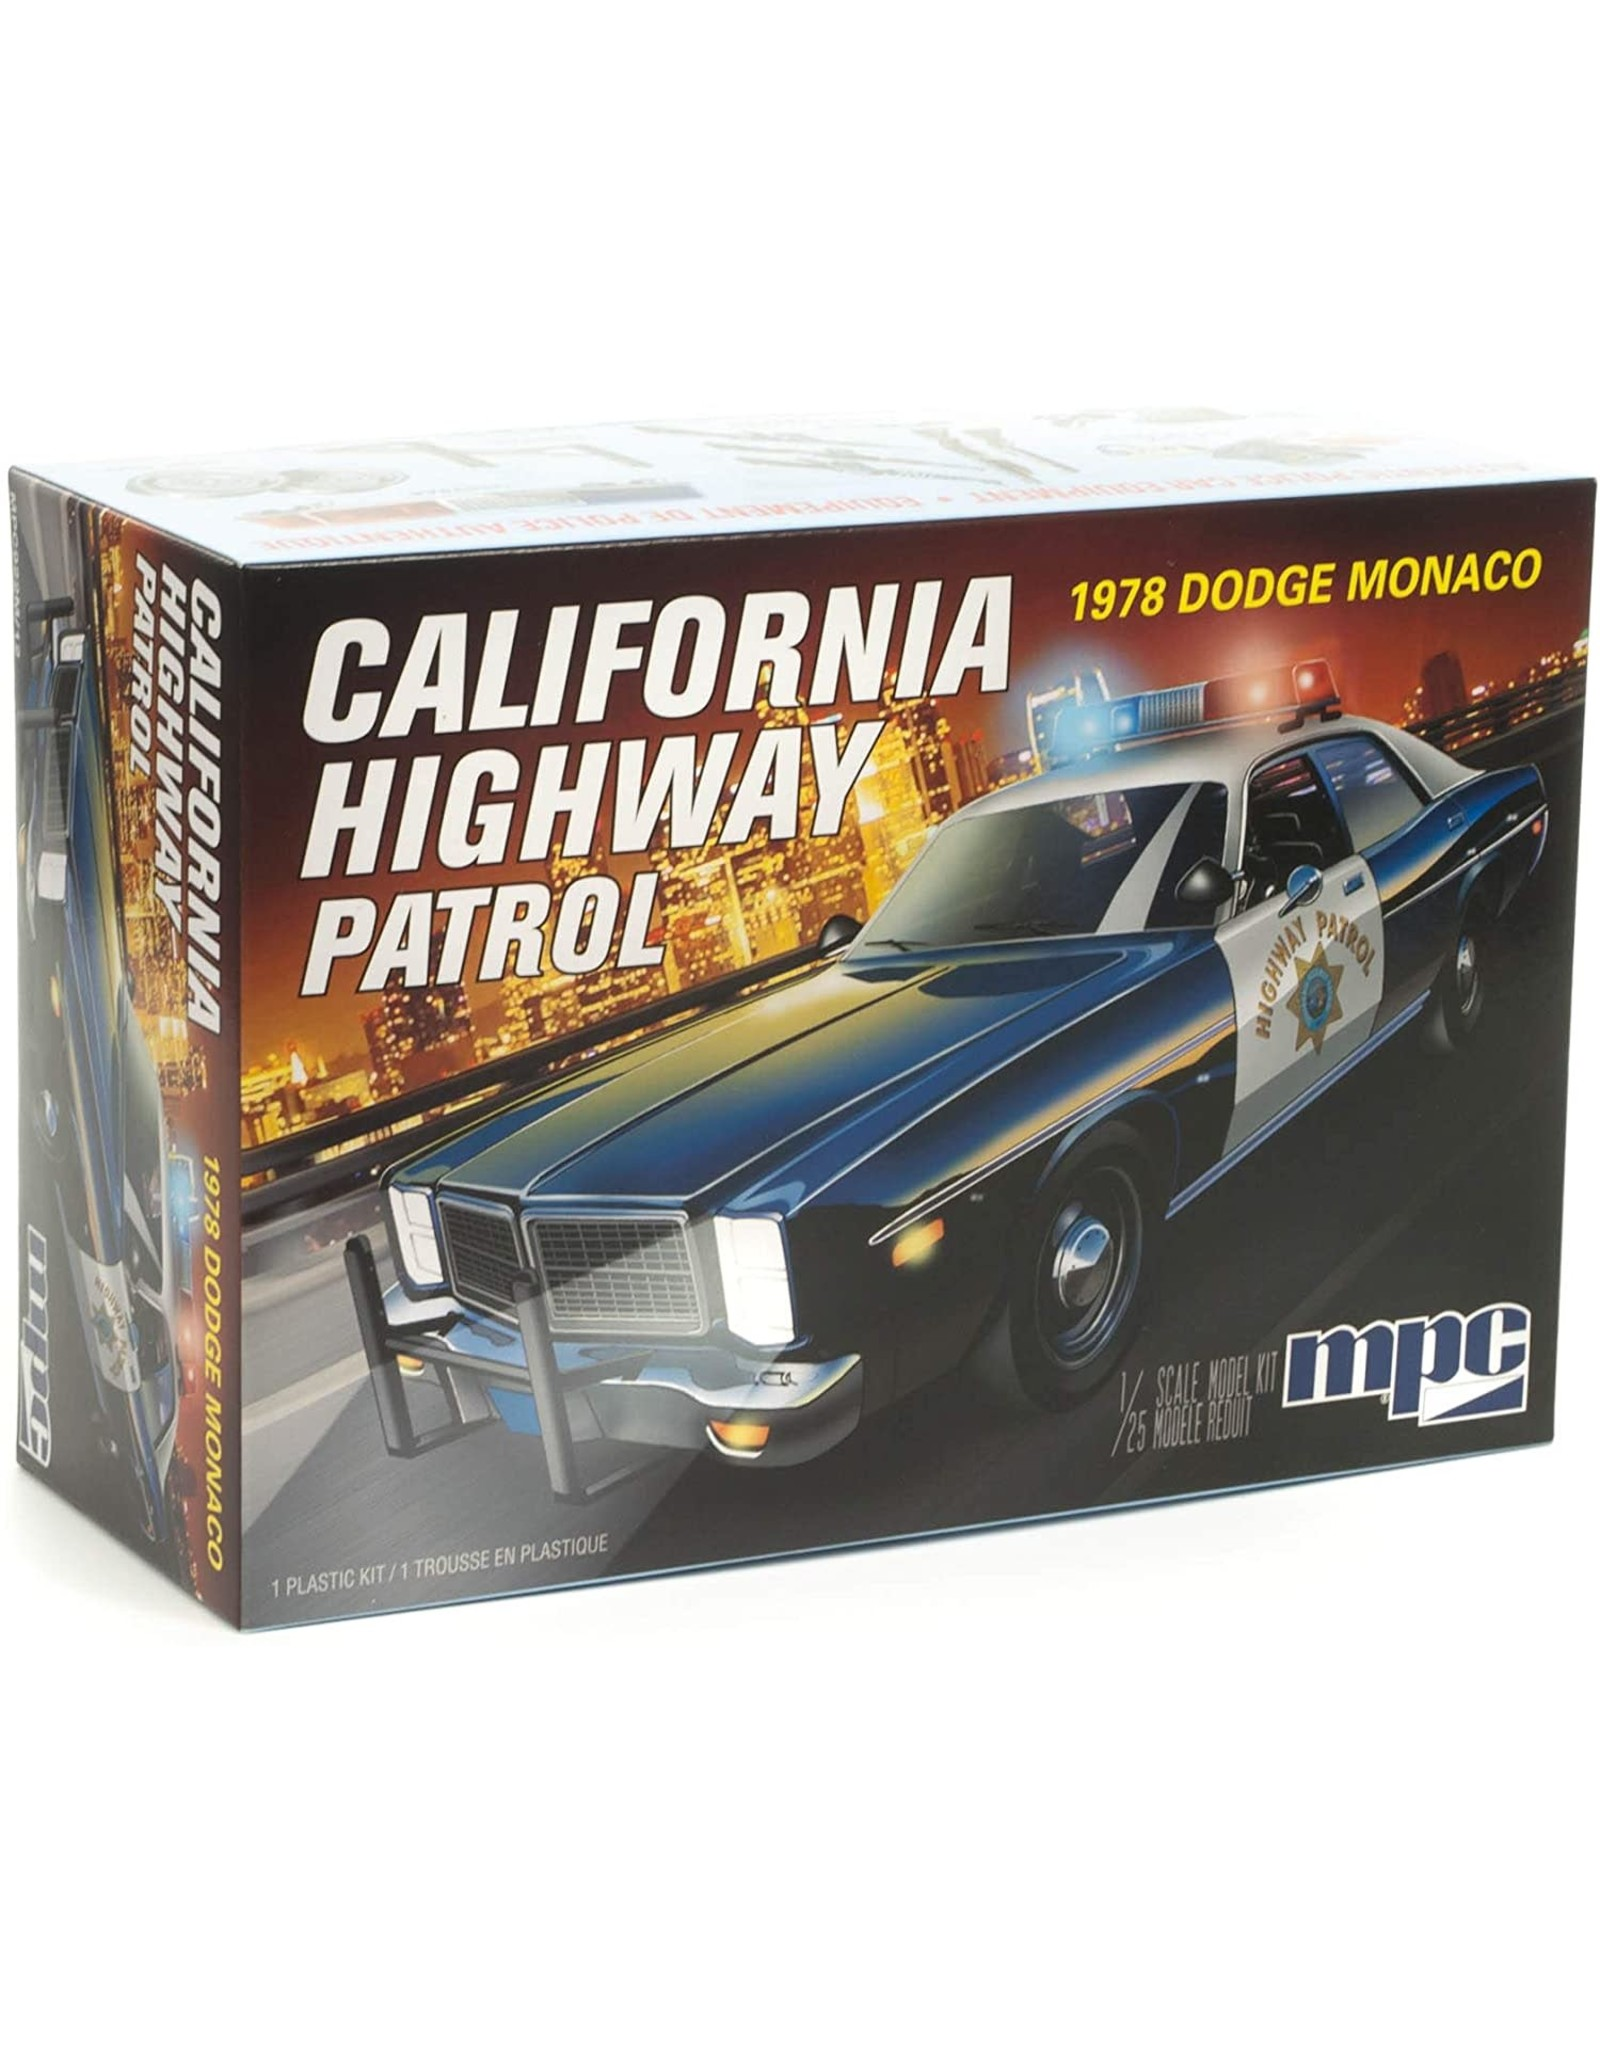 MPC/Round2models 1978 Dodge Monaco California Highway Patrol 1/25 Scale